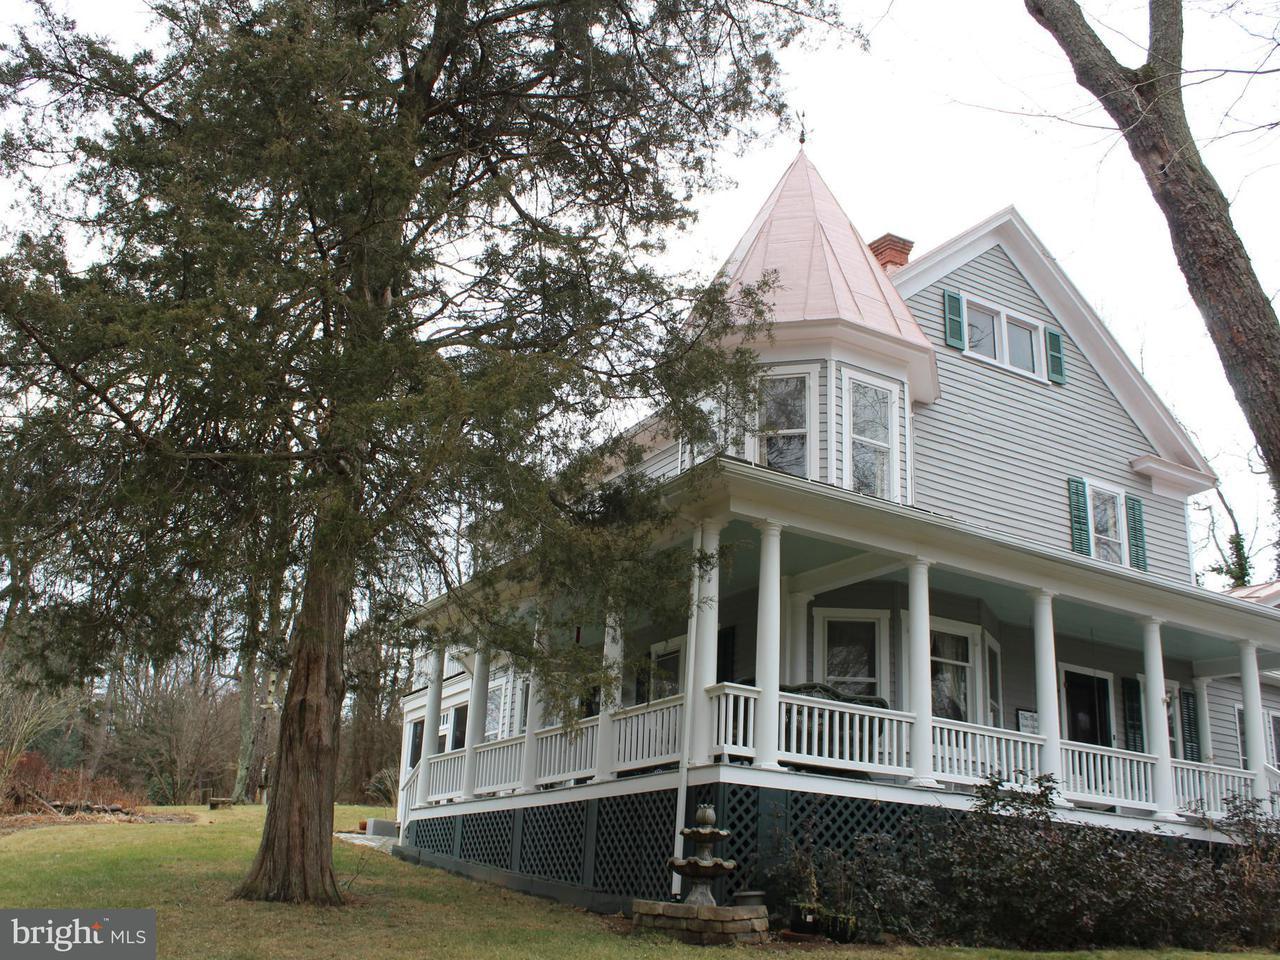 独户住宅 为 销售 在 175 Rodgers Road 175 Rodgers Road Rileyville, 弗吉尼亚州 22650 美国